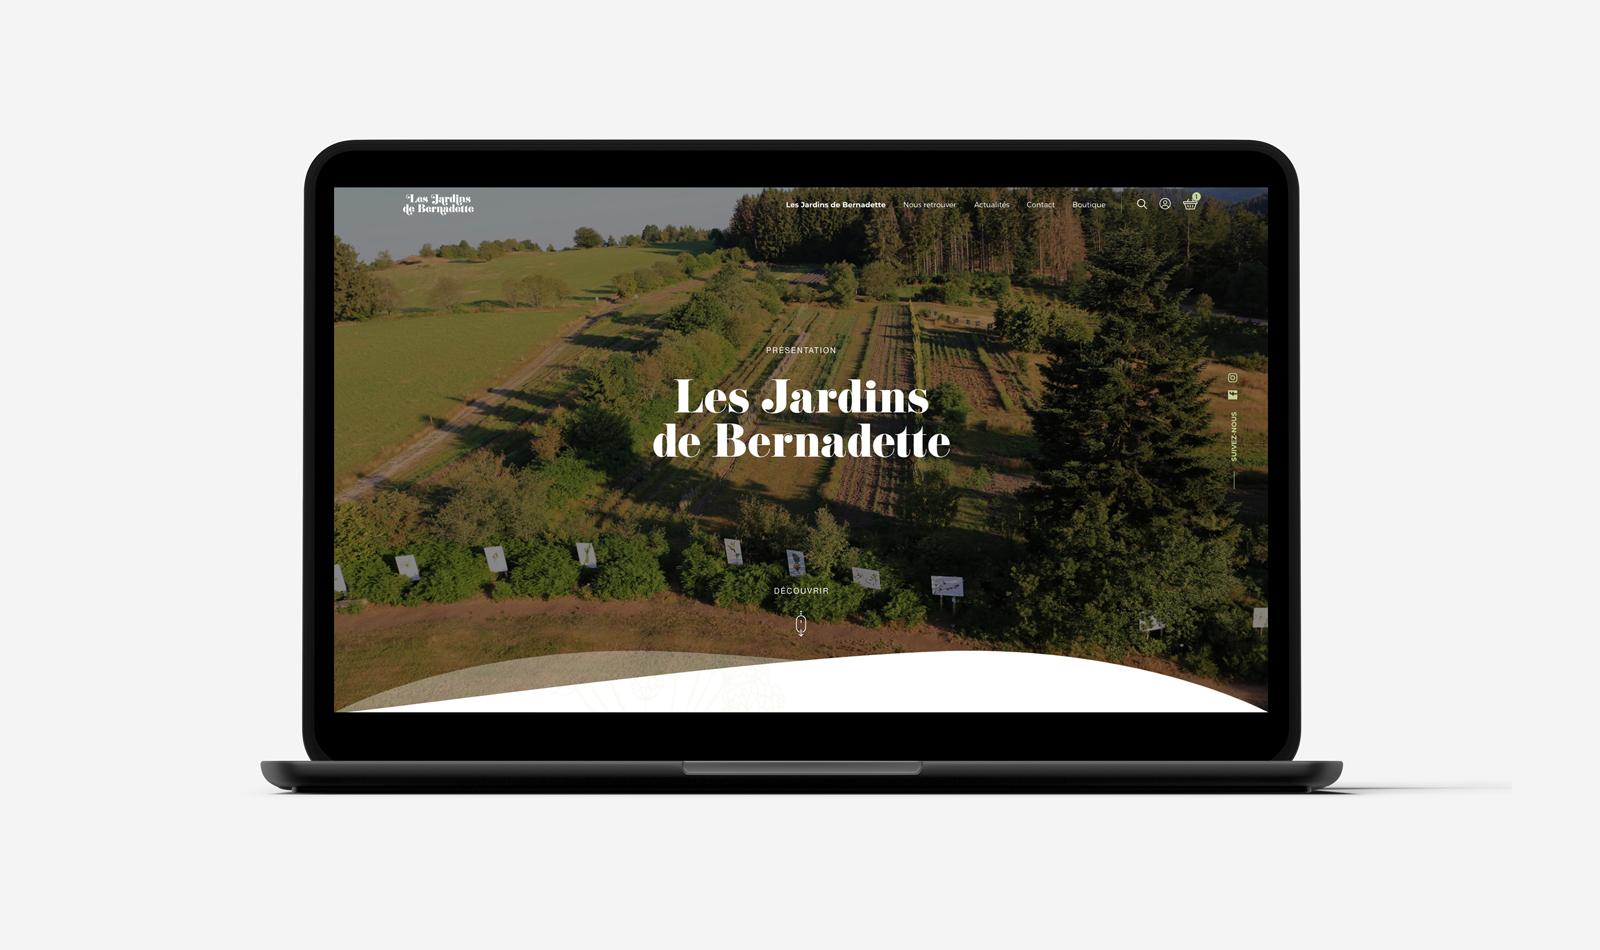 Les-jardins-de-Bernadette-macbook-josselin tourette-1